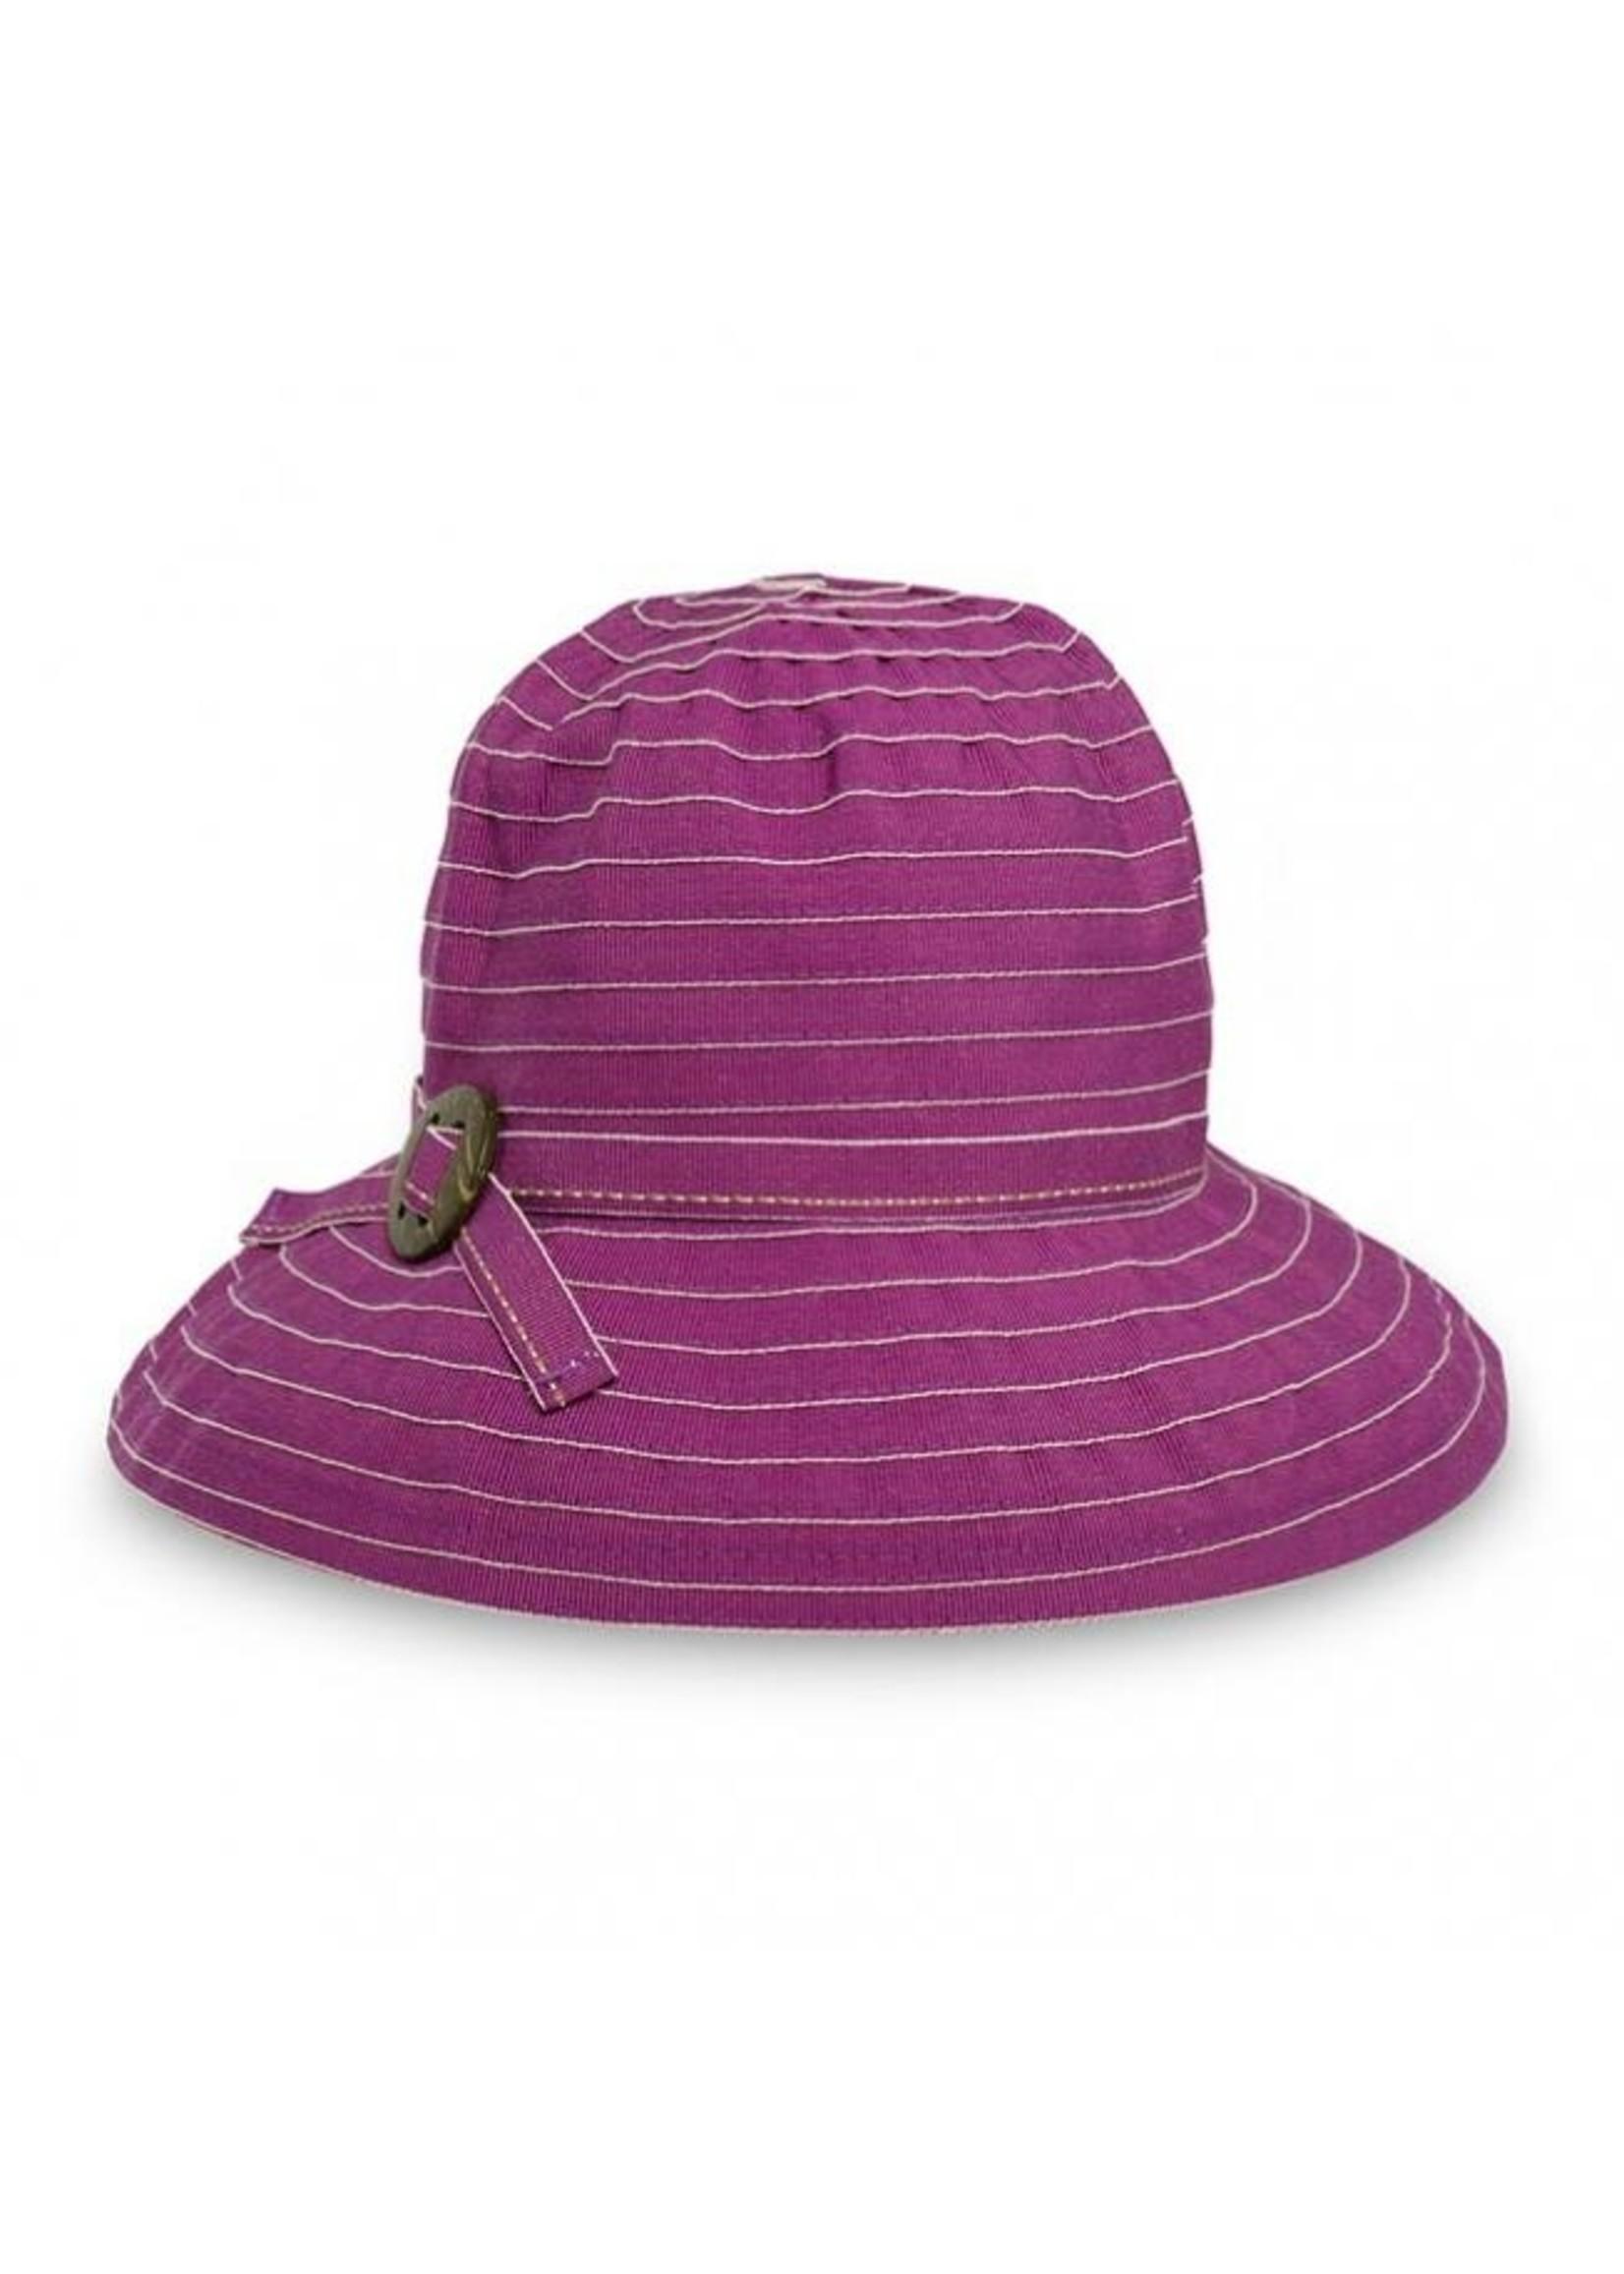 Sunday Afternoons EMMA HAT